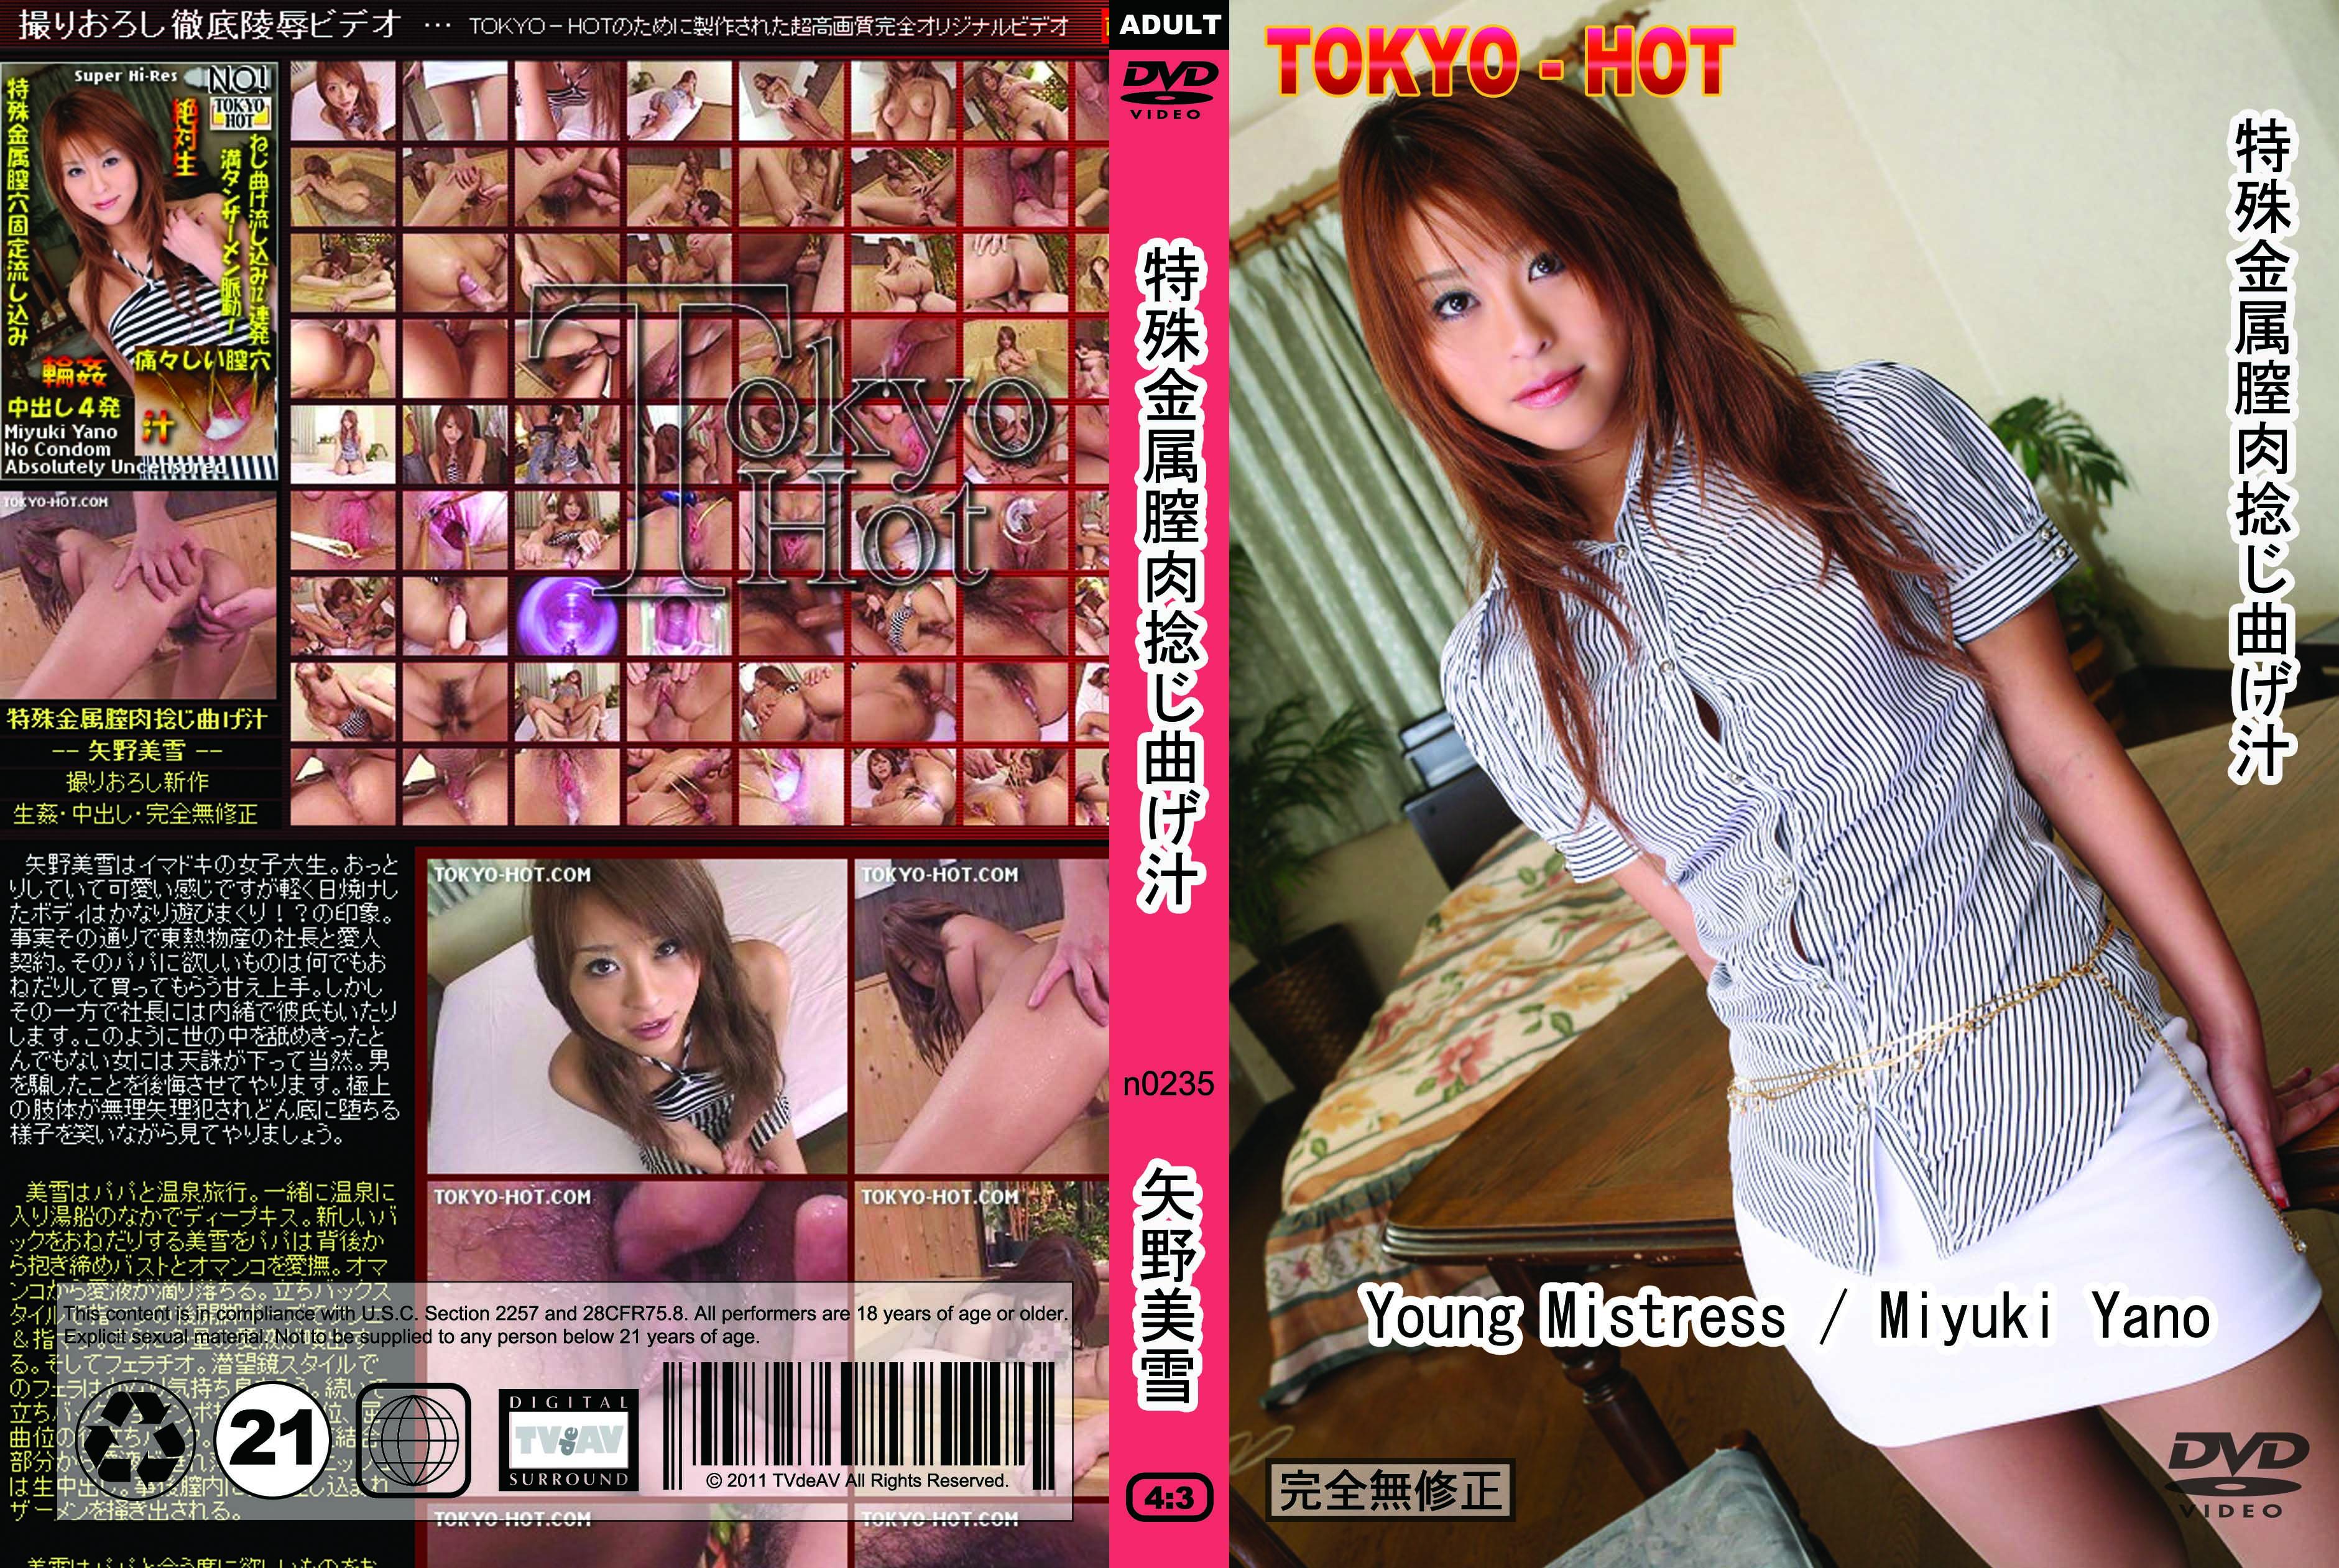 tokyo-hot-n0235-cd1-特殊金属膣肉捻じ曲げ汁